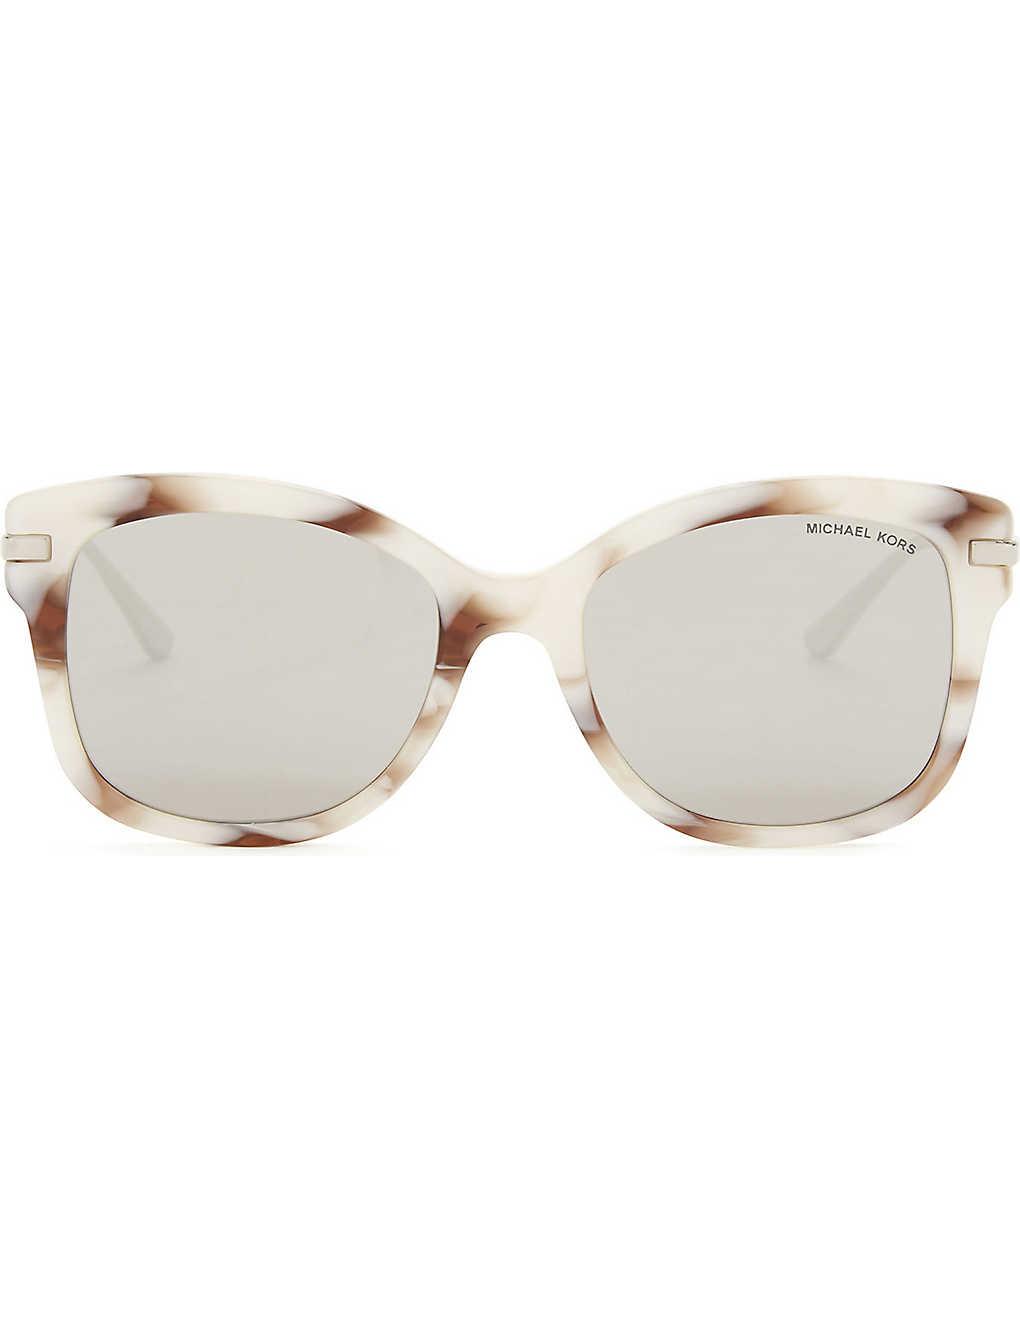 e8dee1e9e5 MICHAEL KORS - Mk2047 Lia square-frame sunglasses